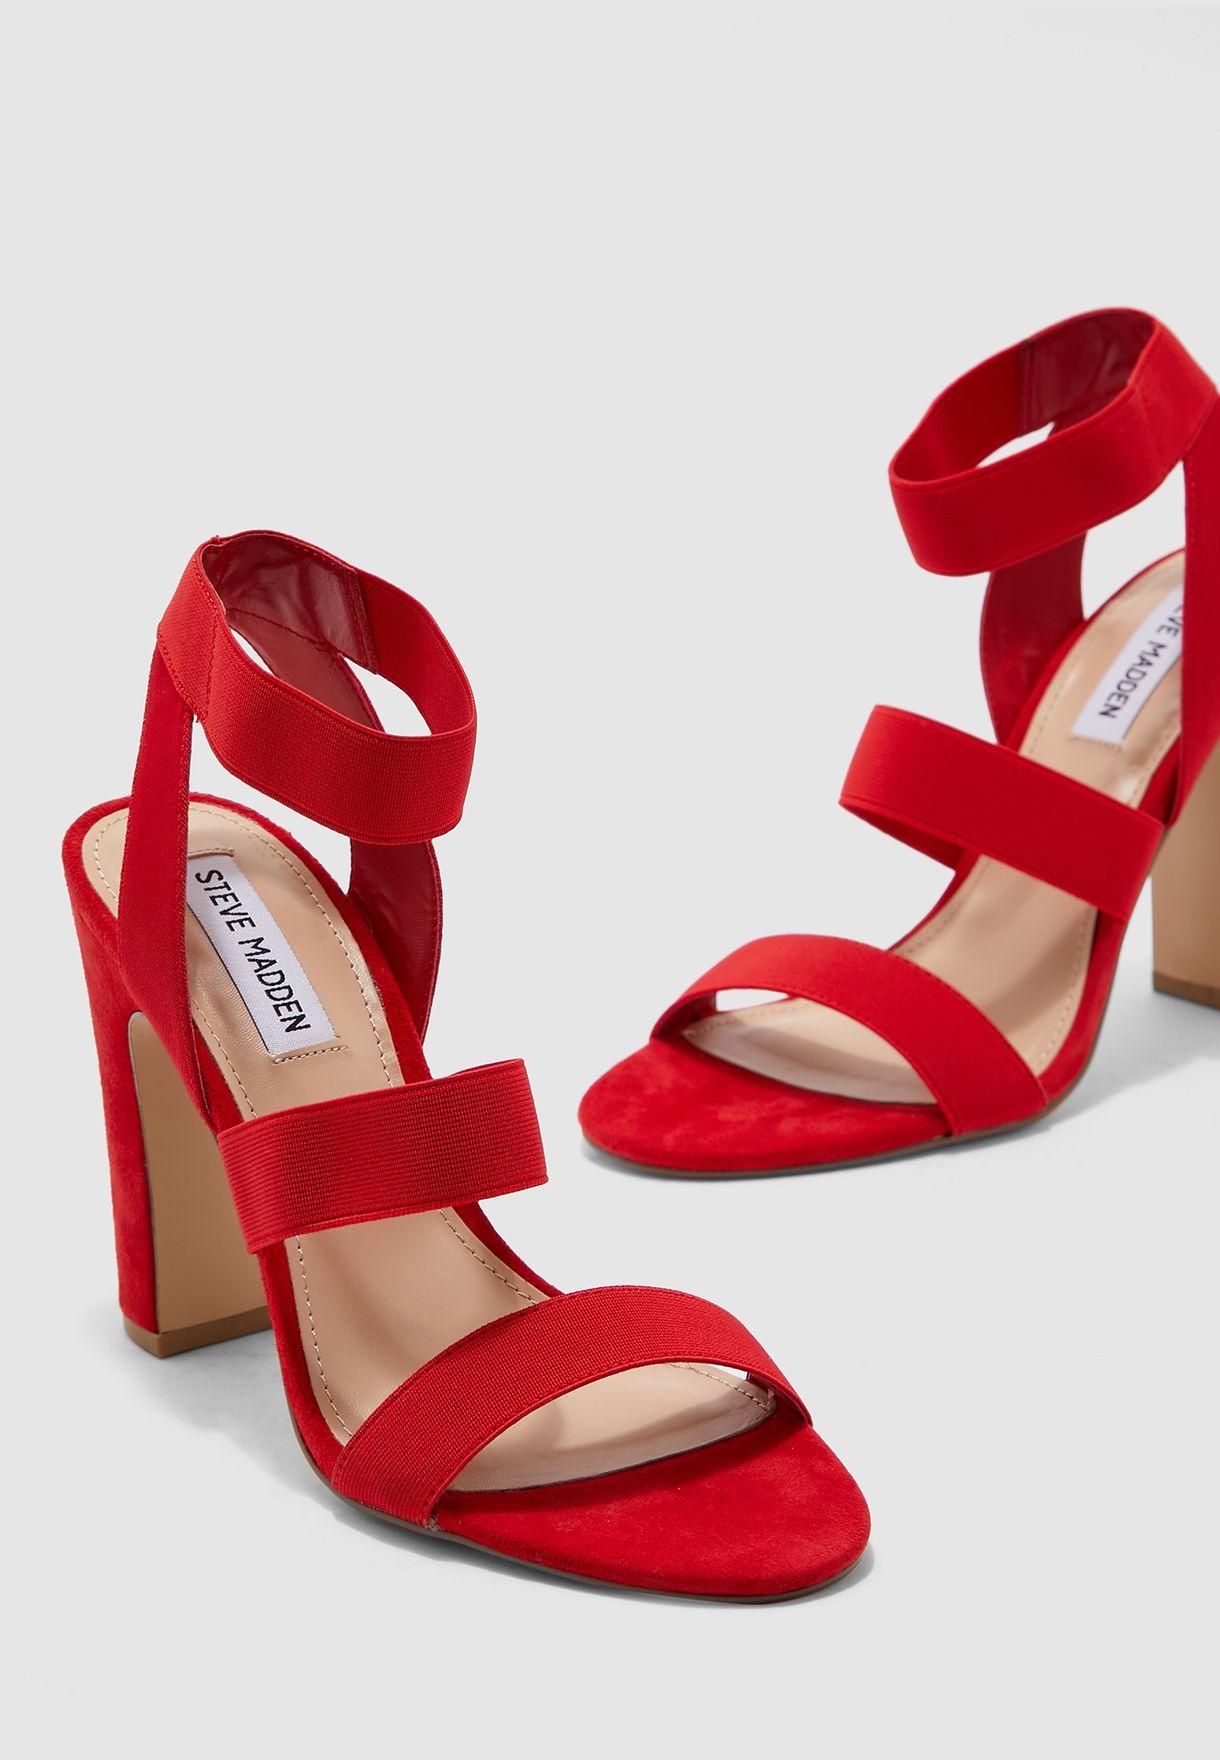 steve madden red strappy heels